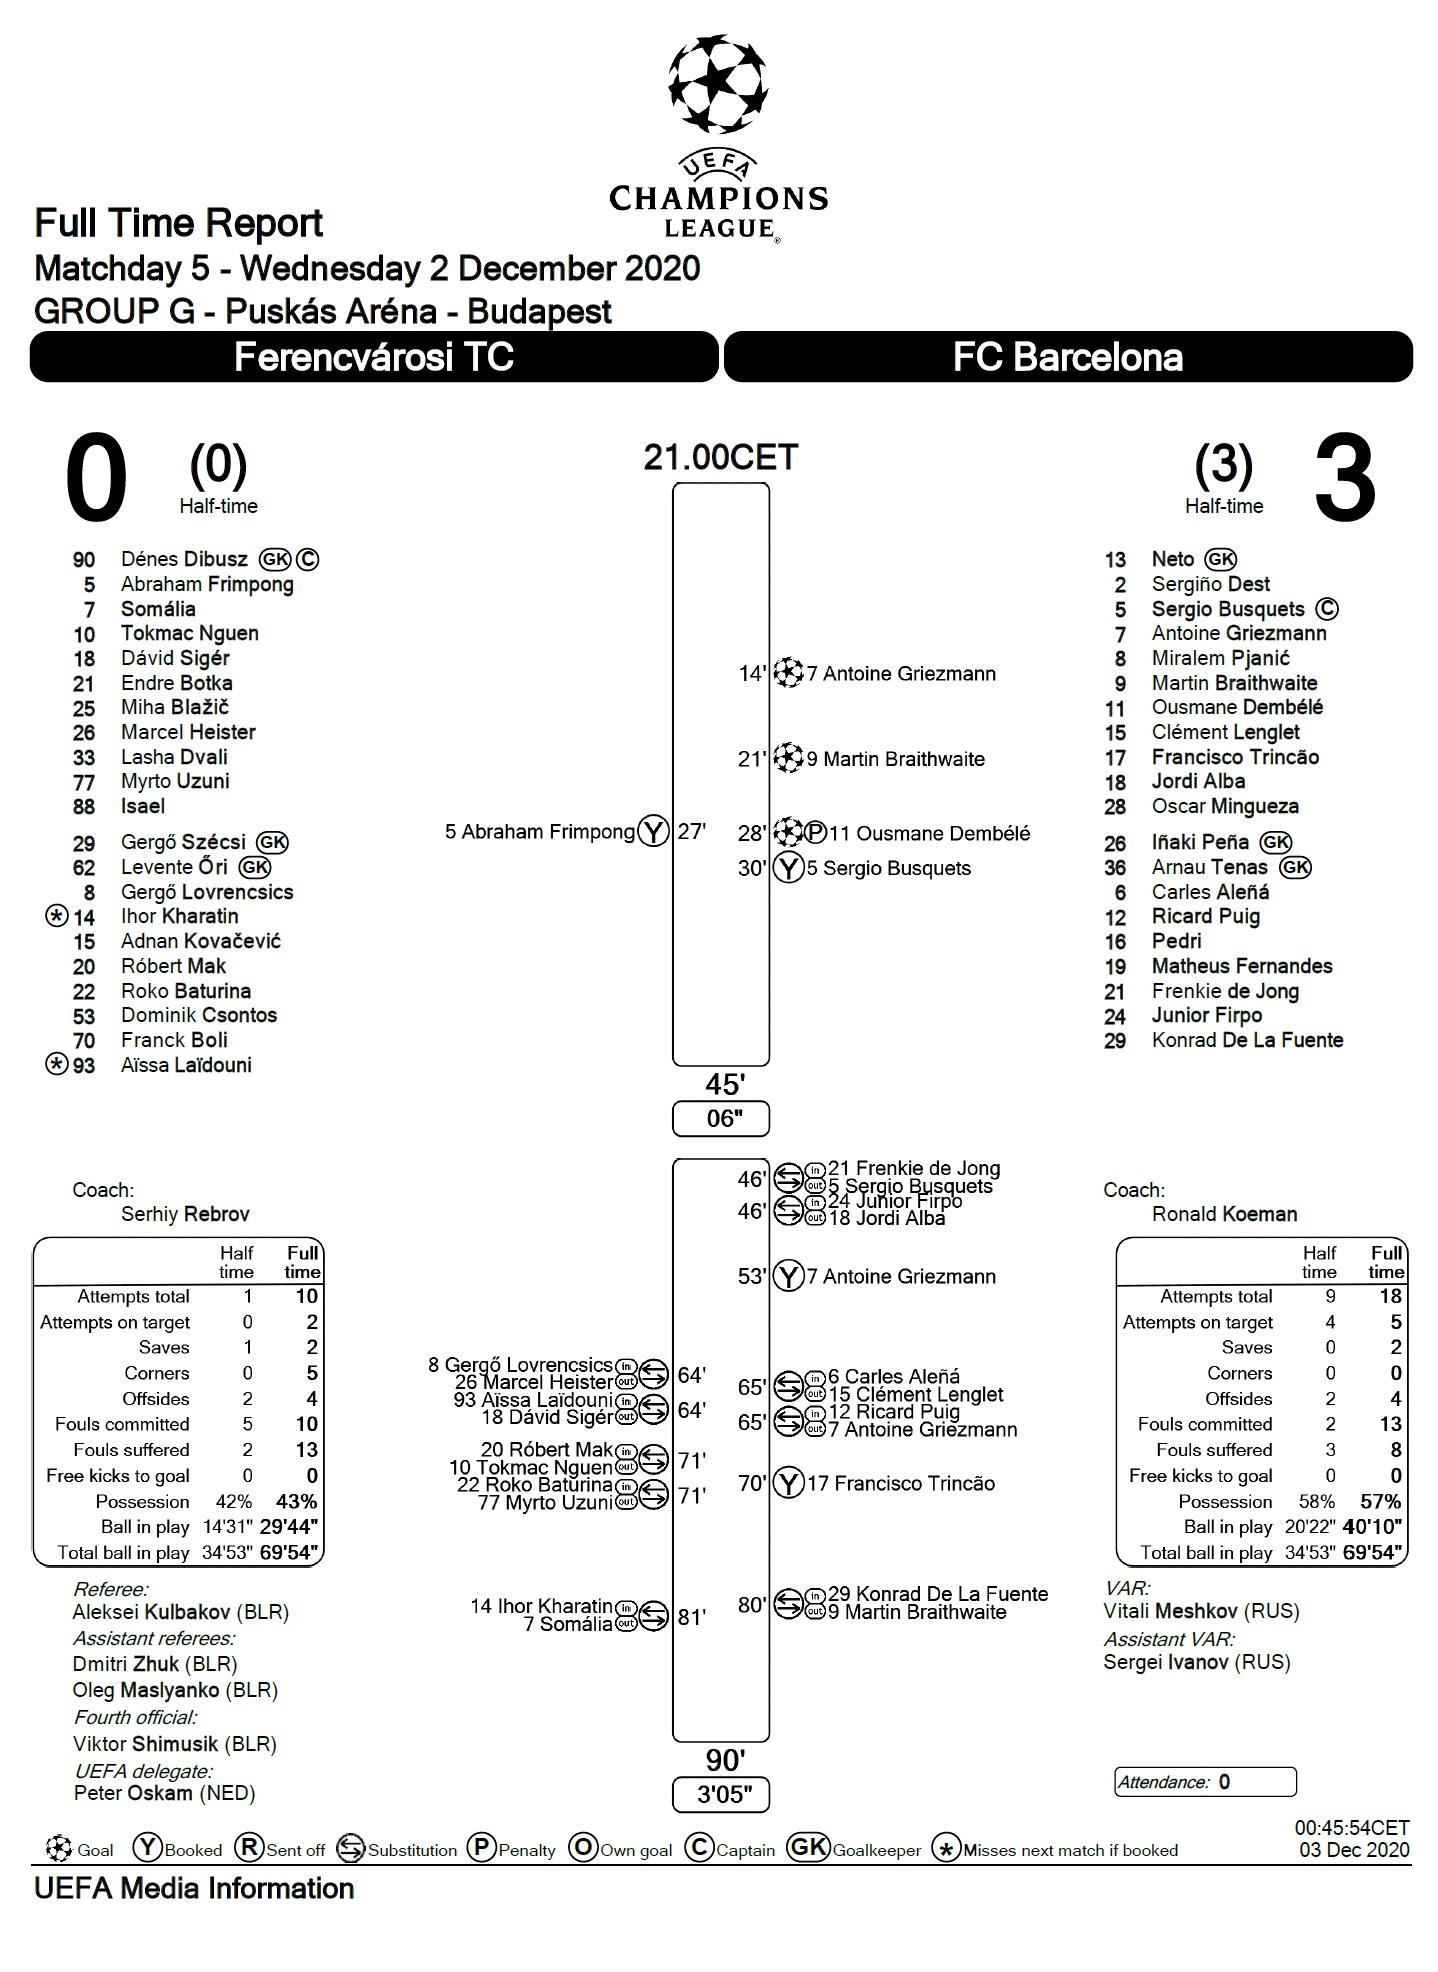 Ференцварош (Венгрия) - Барселона (Испания) 0:3